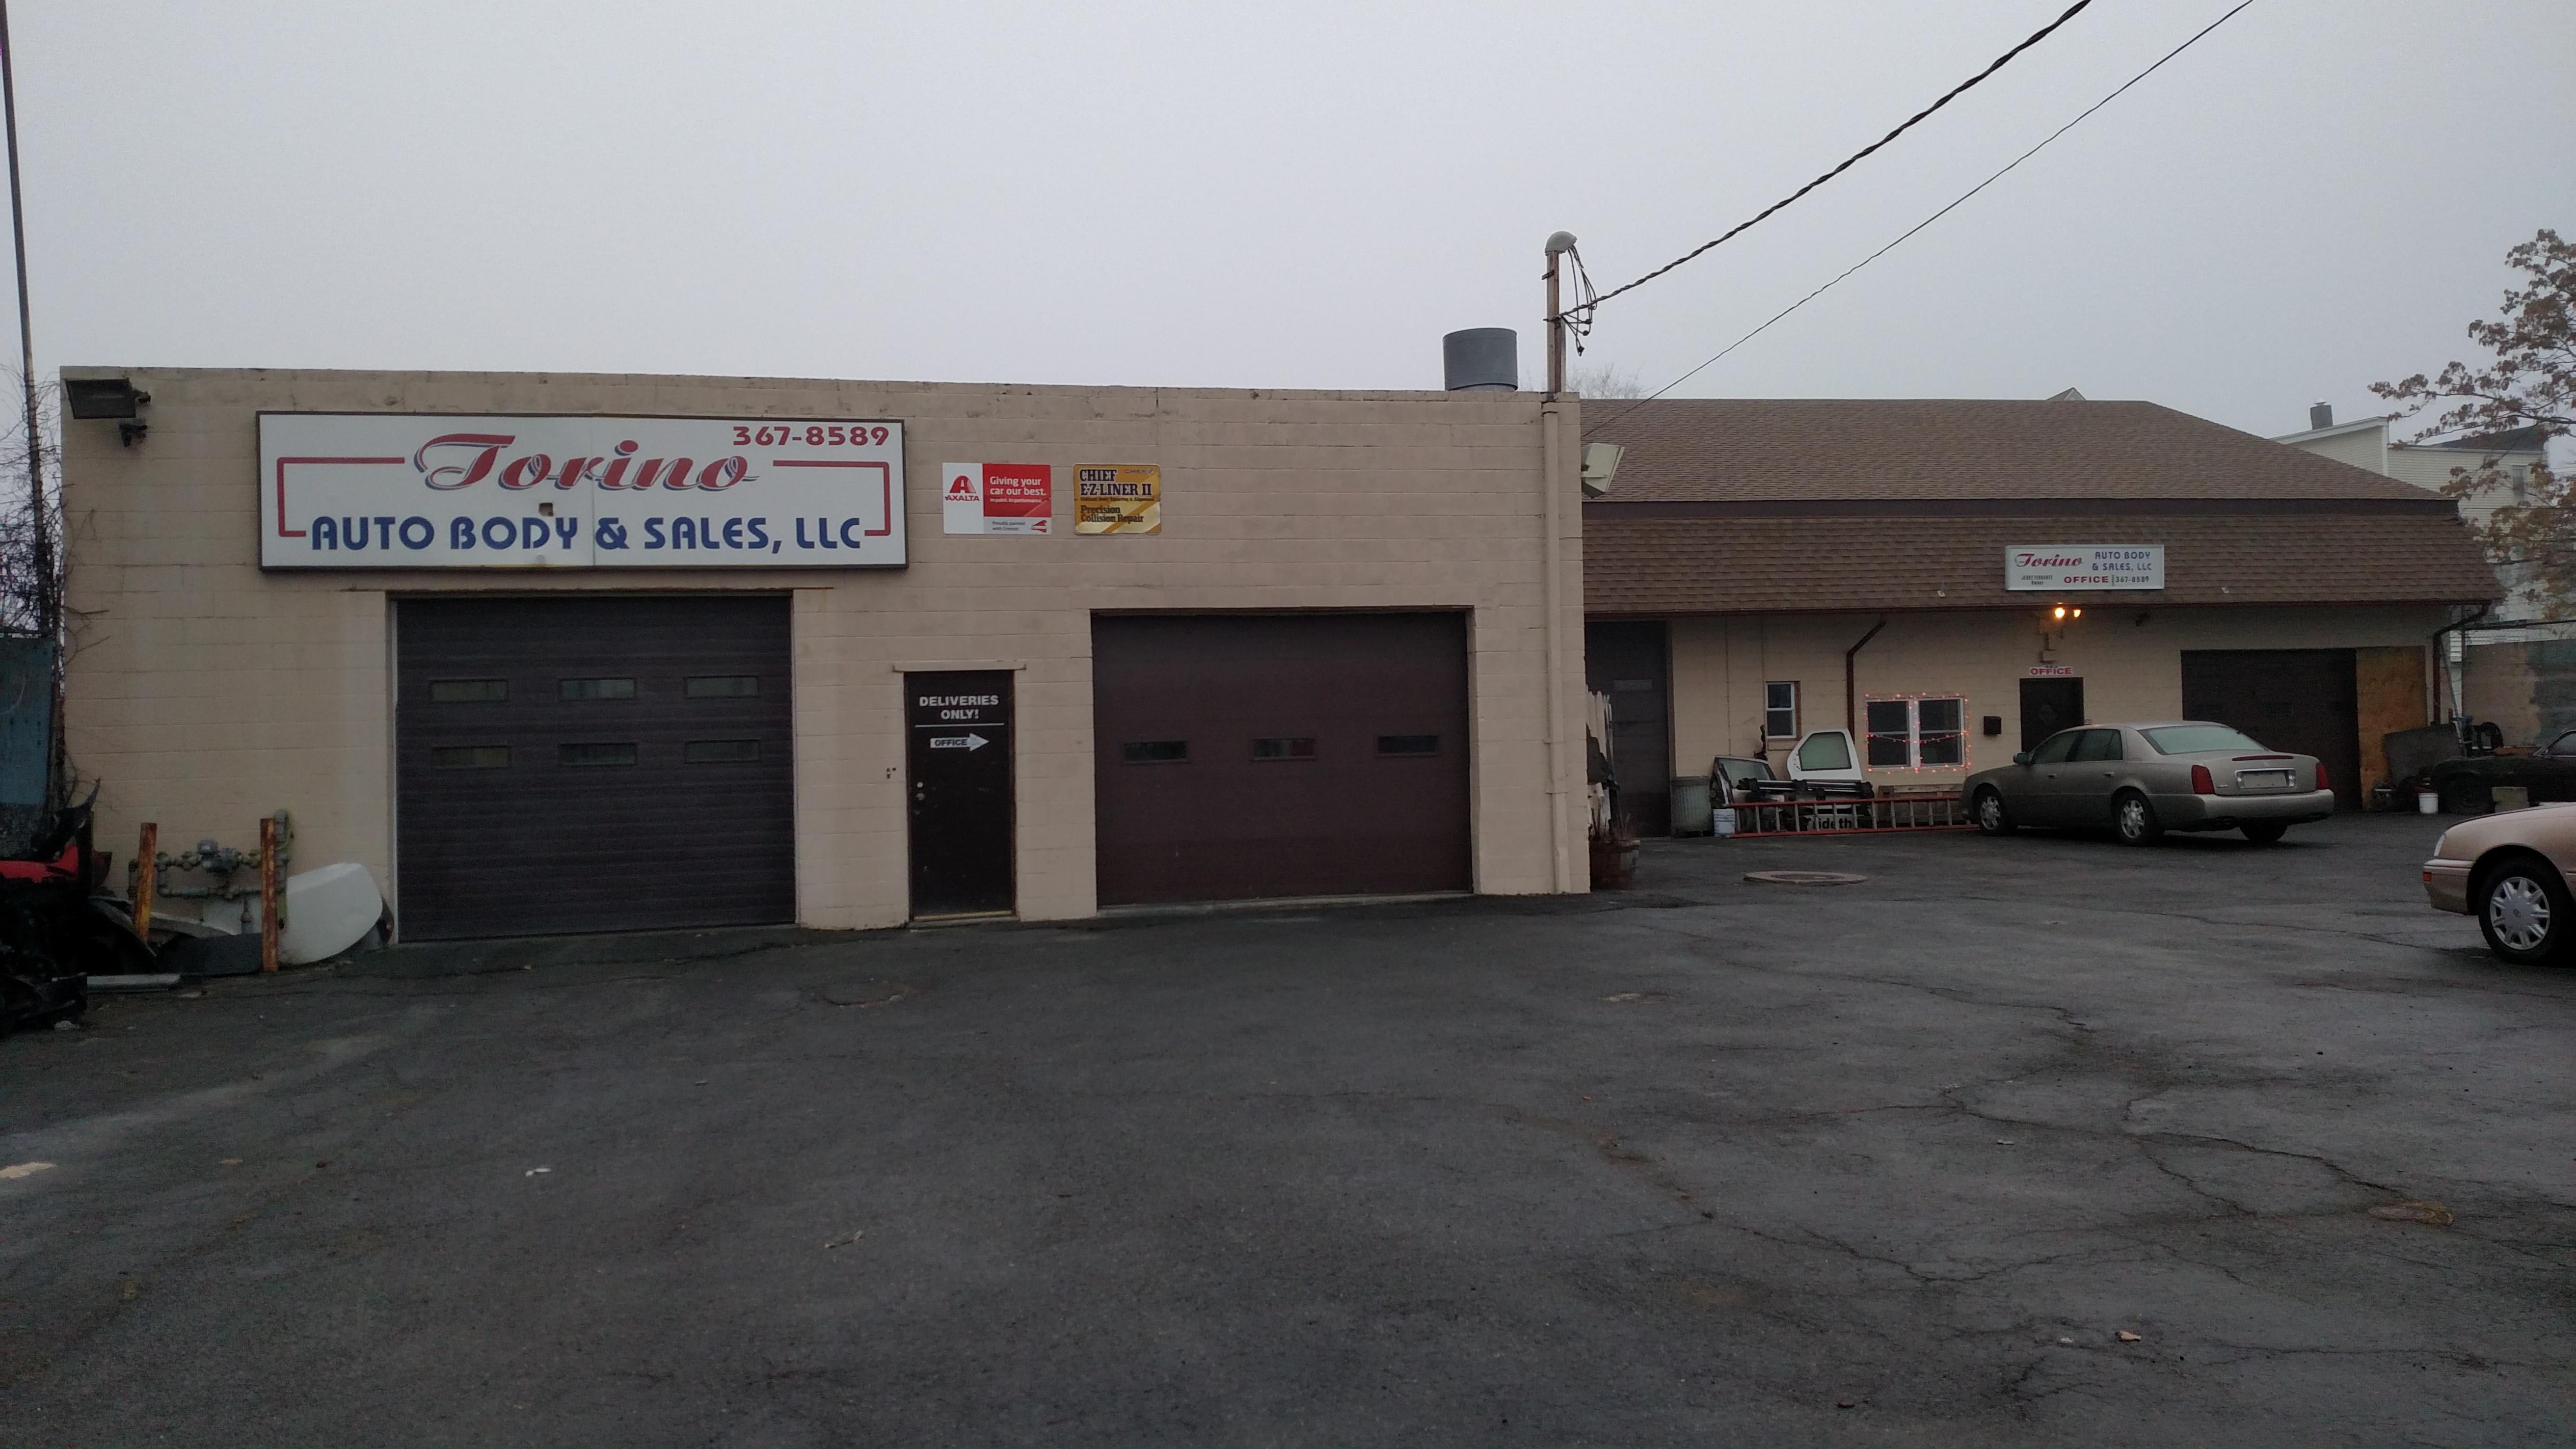 Marick Auto Sales LLC Reviews Testimonials: Business Directory For Bridgeport, CT